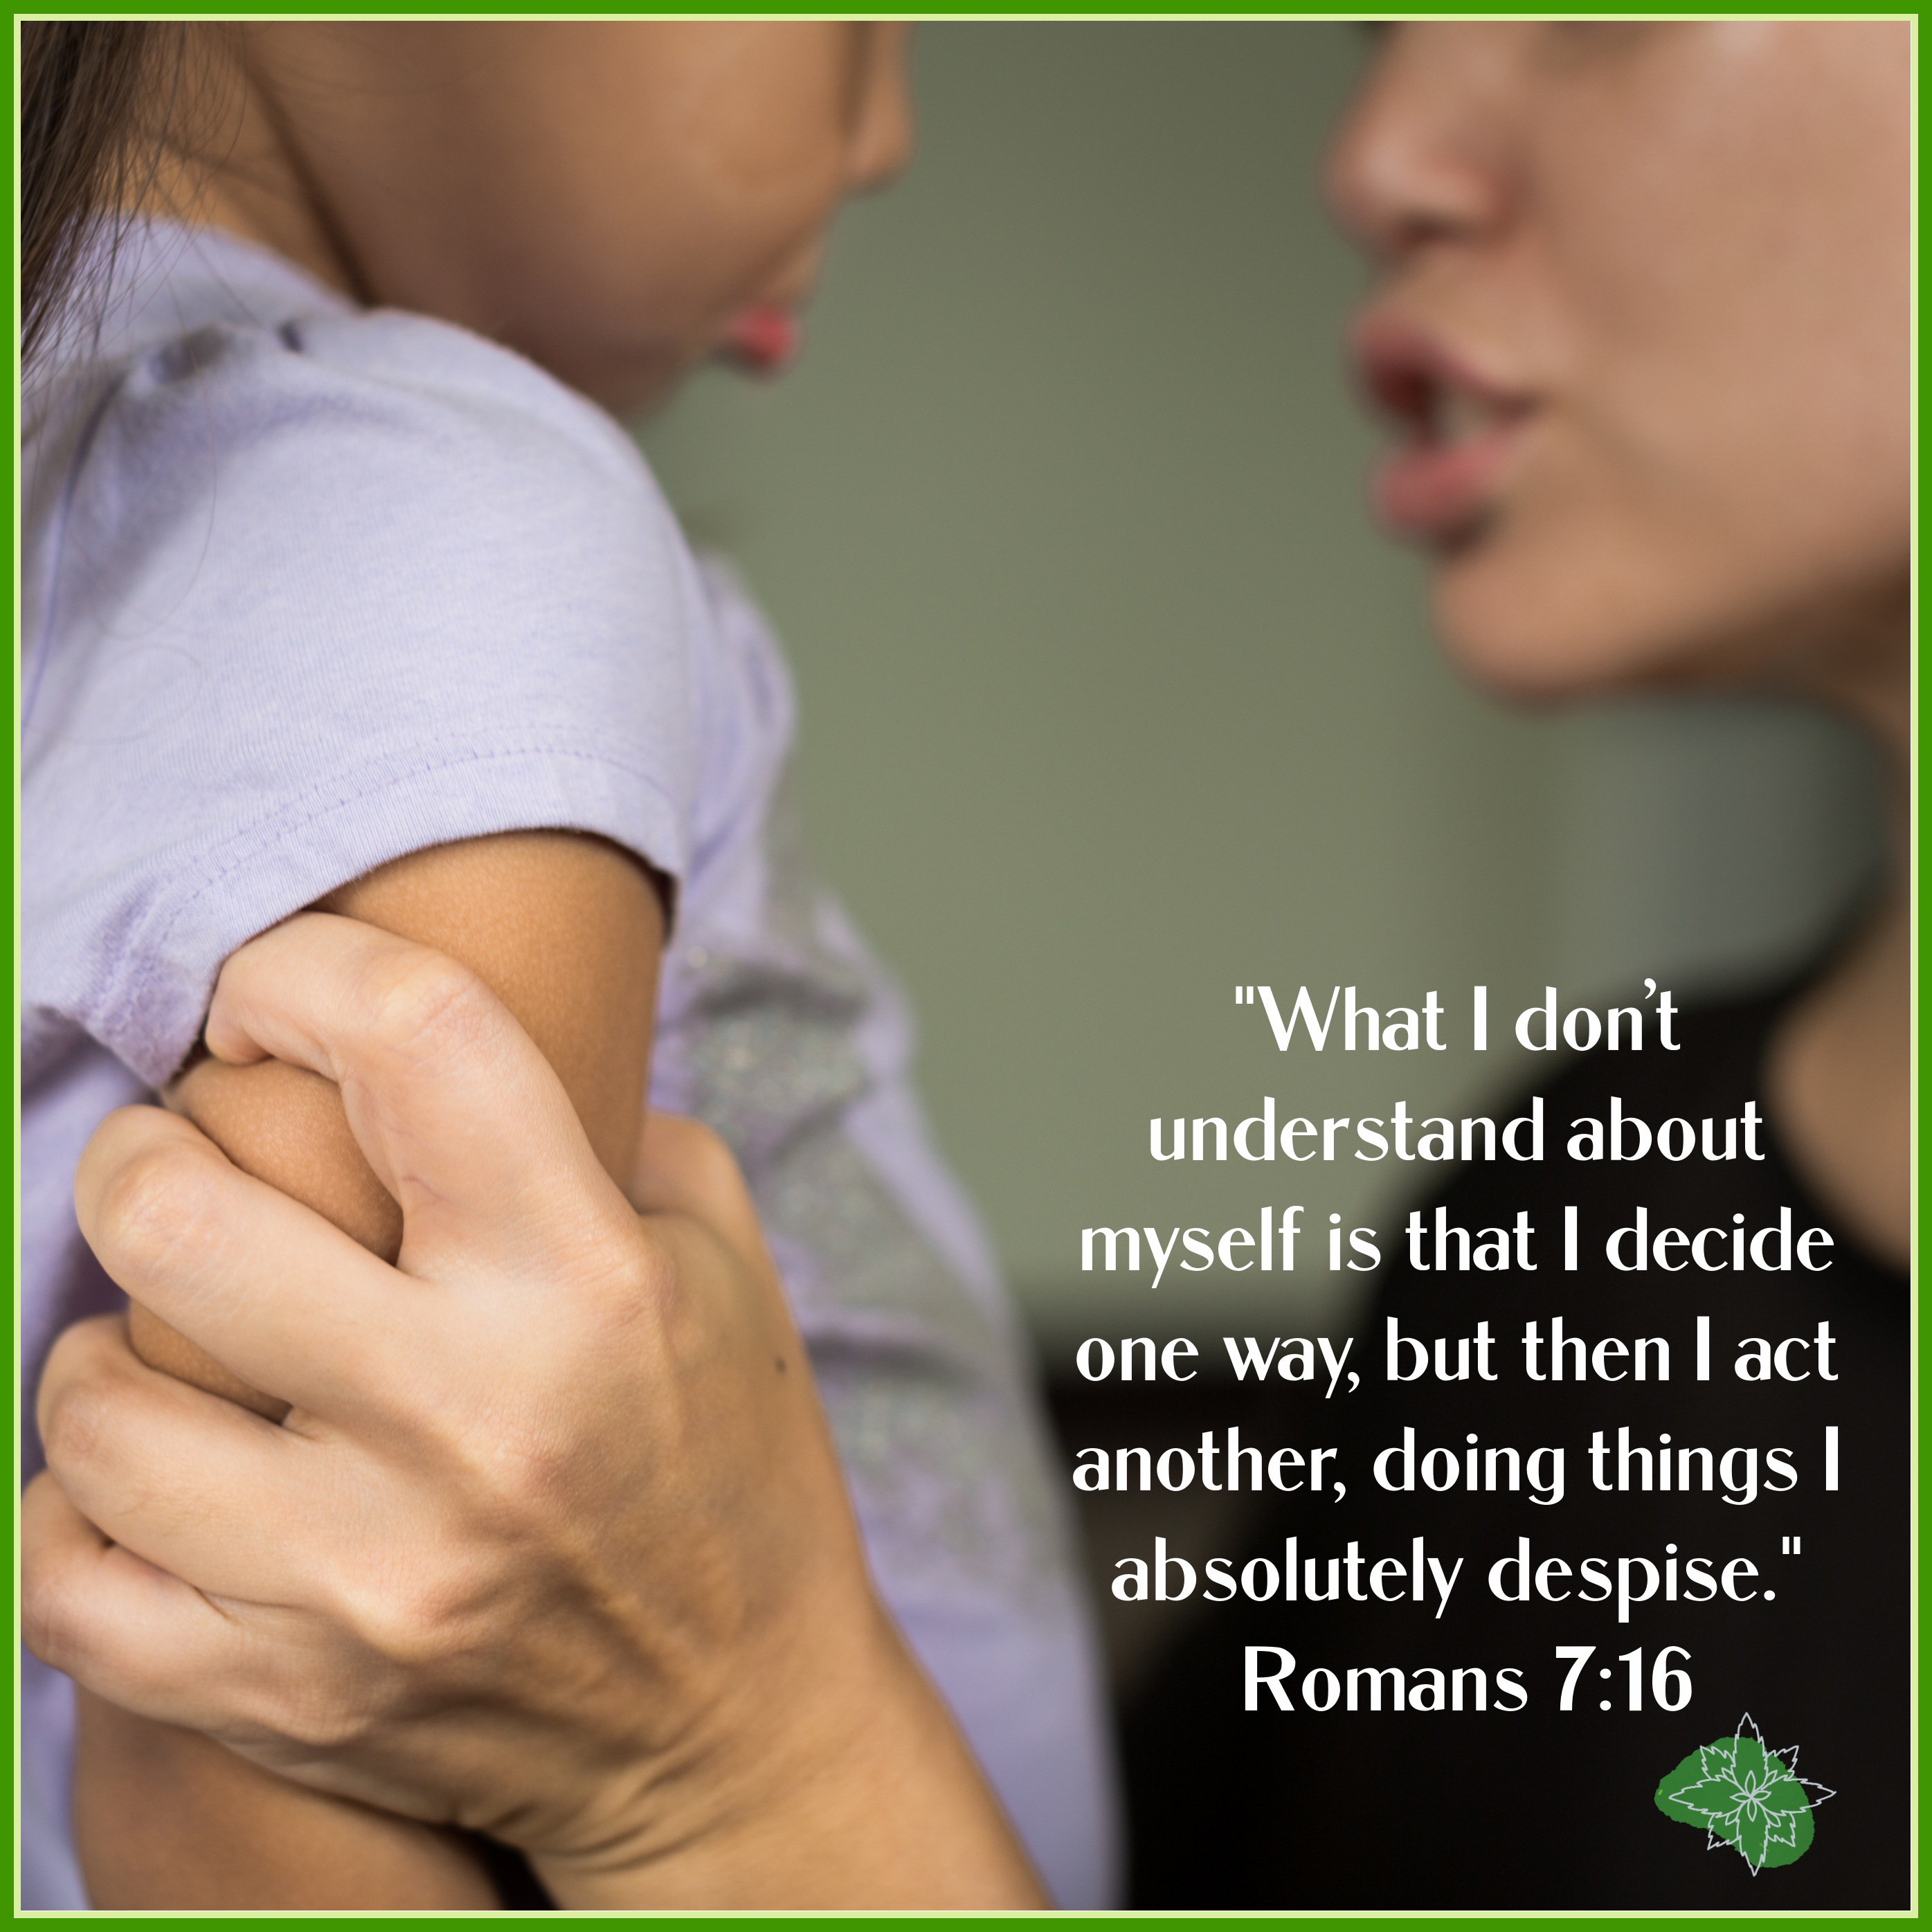 Romans 7:16 quote